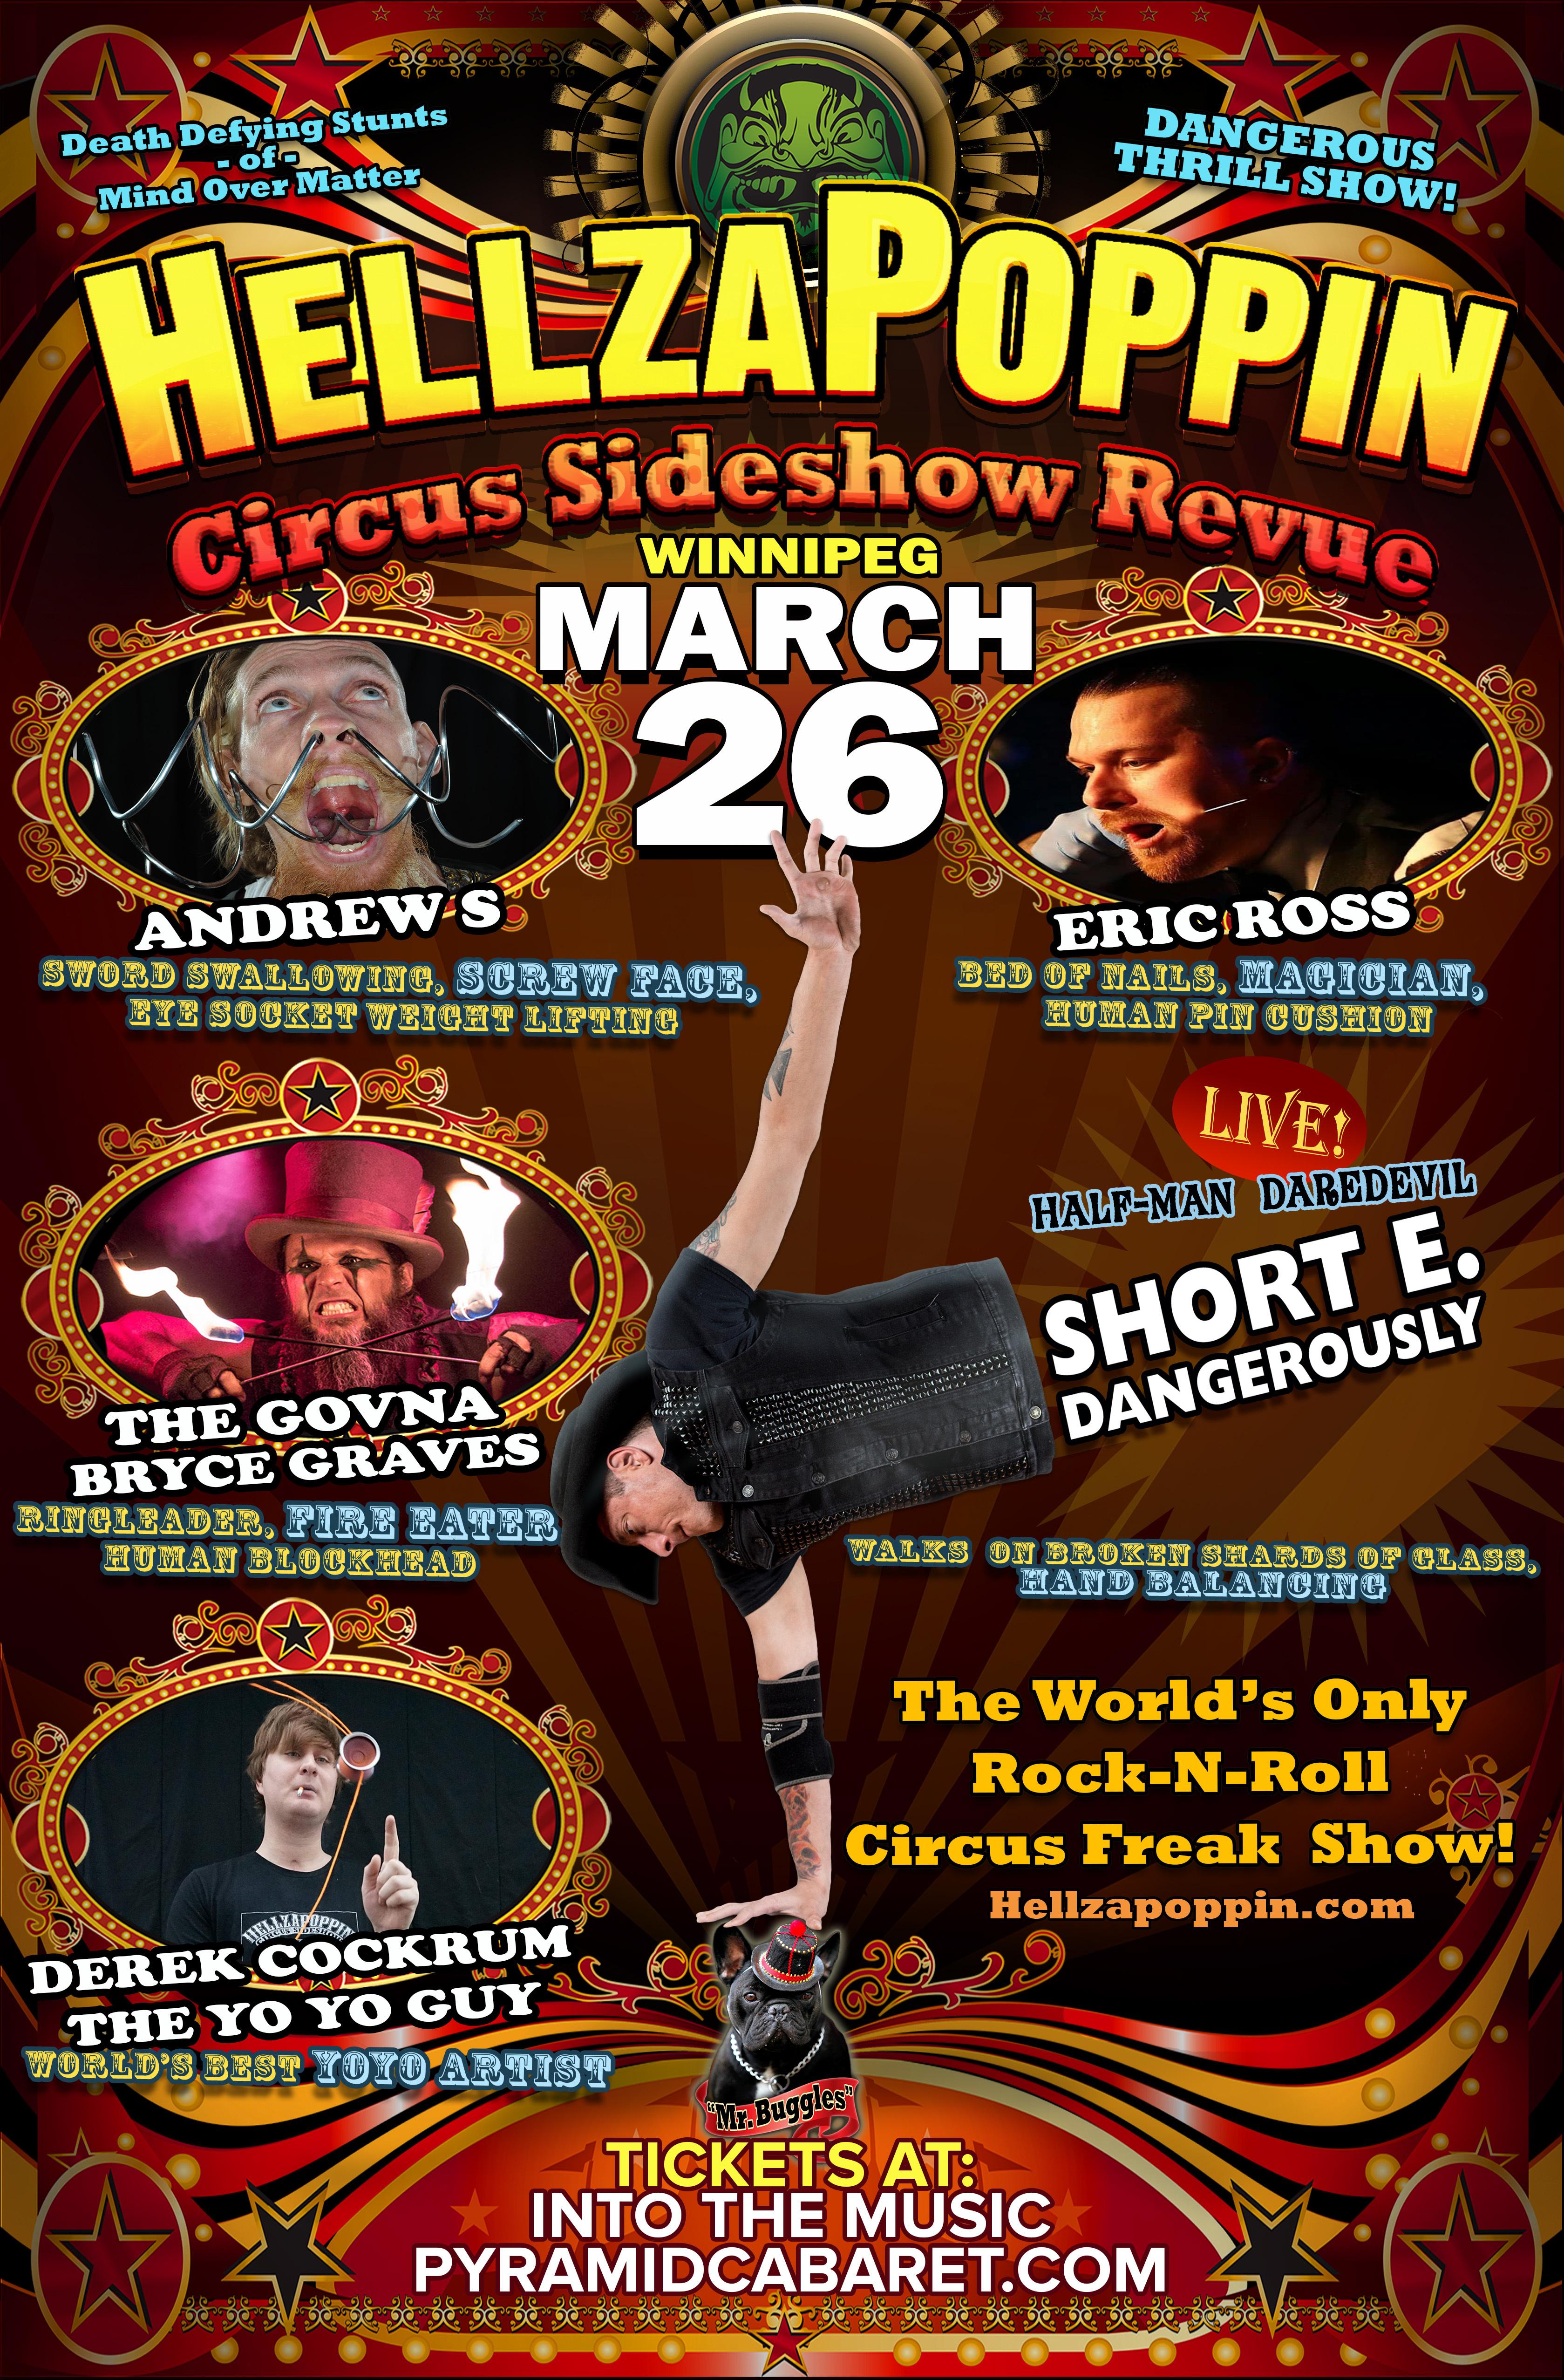 HELLZAPOPPIN Circus Sideshow - The PYRAMID - MAR. 26 00175